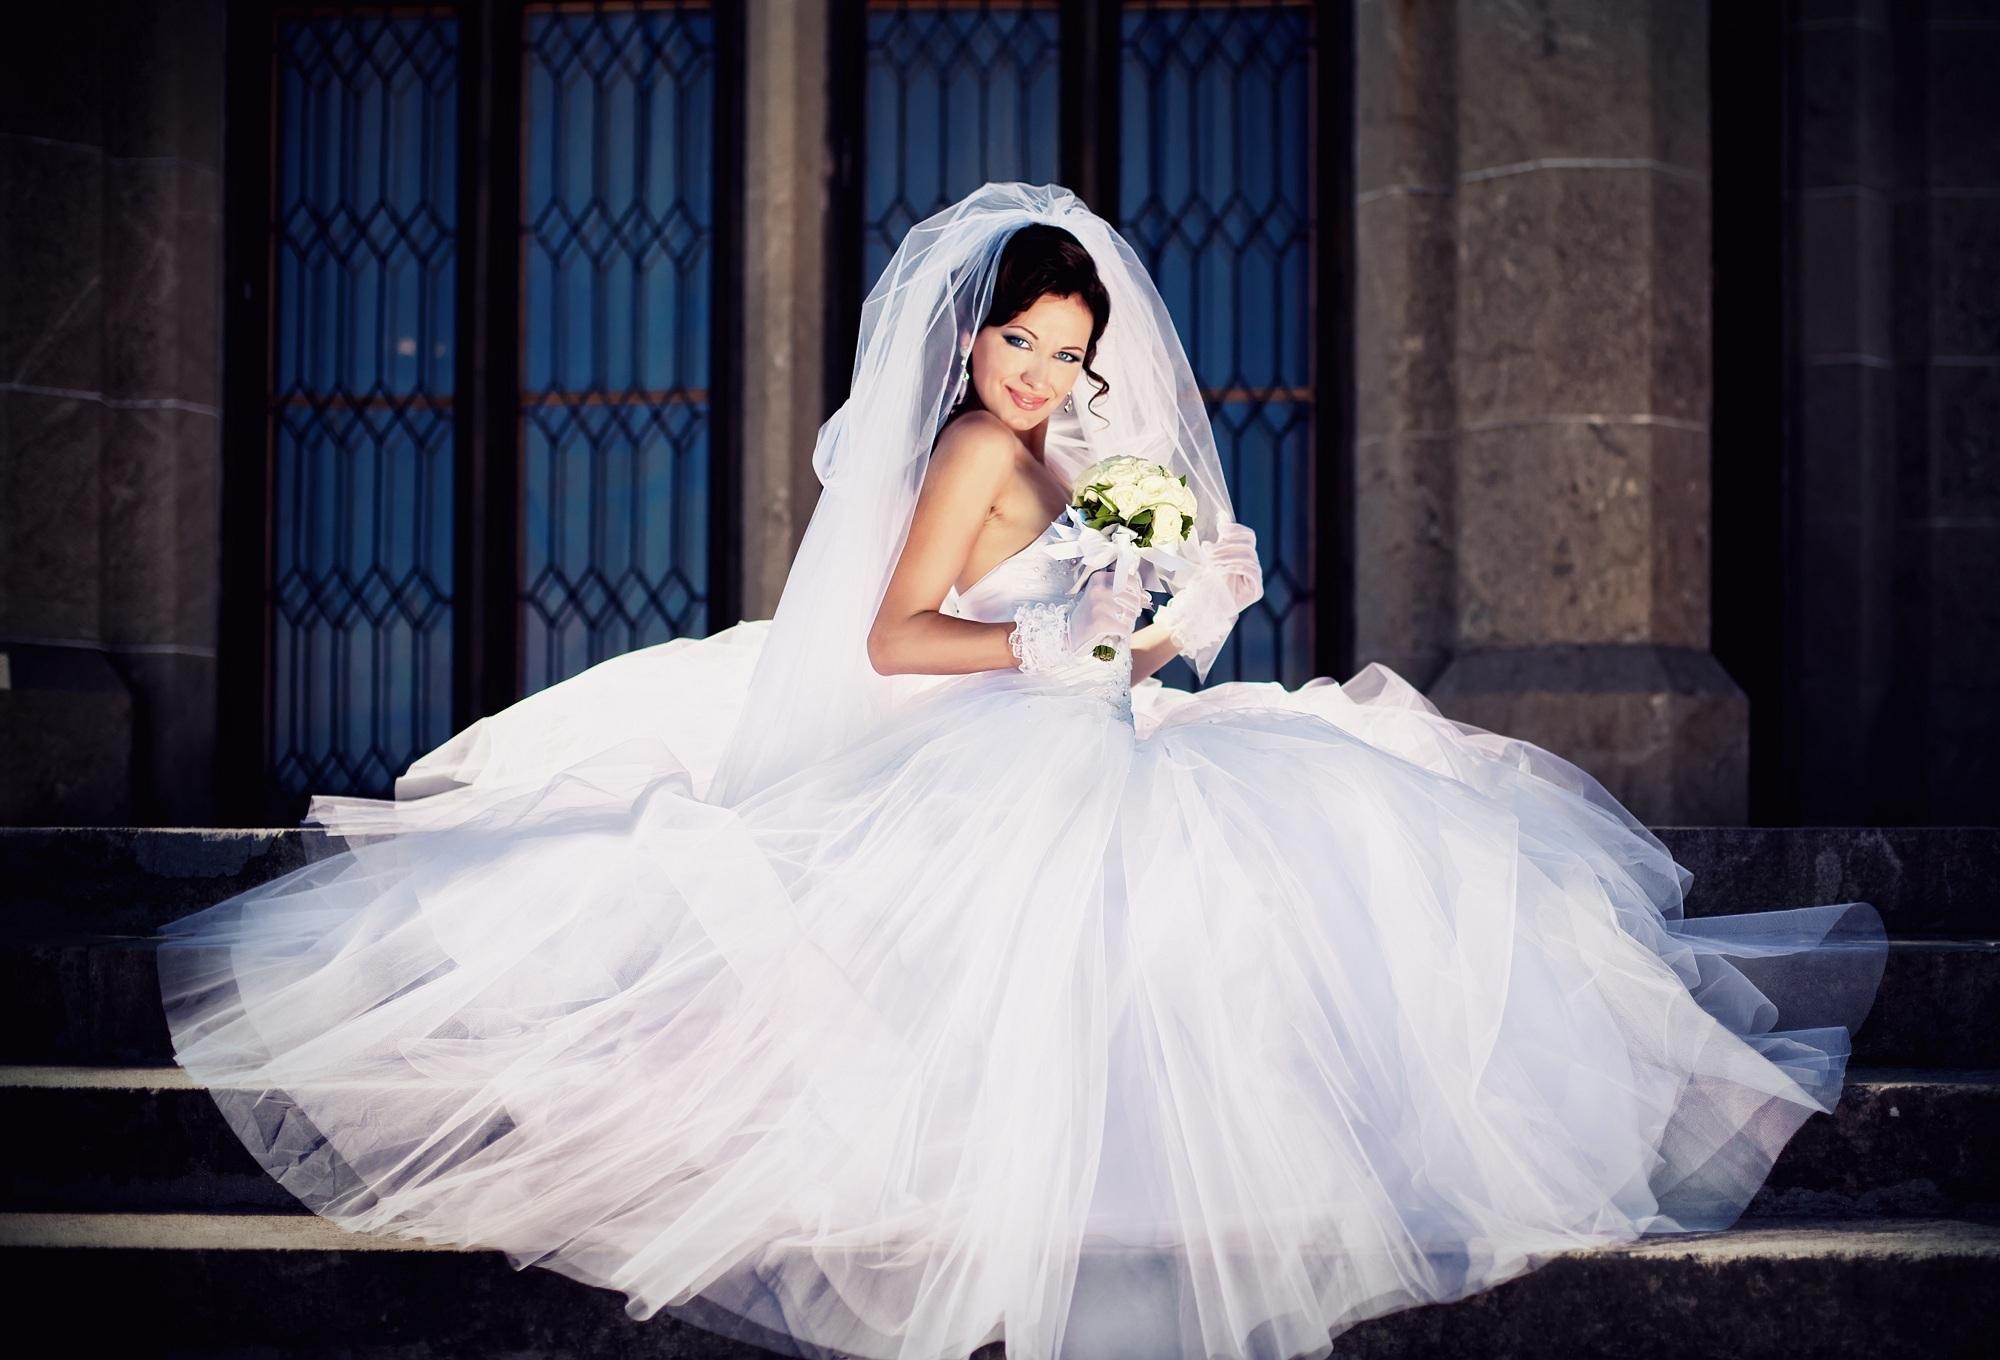 Kenapa pengantin wanita bermimpi: buku impian tentang pengantin